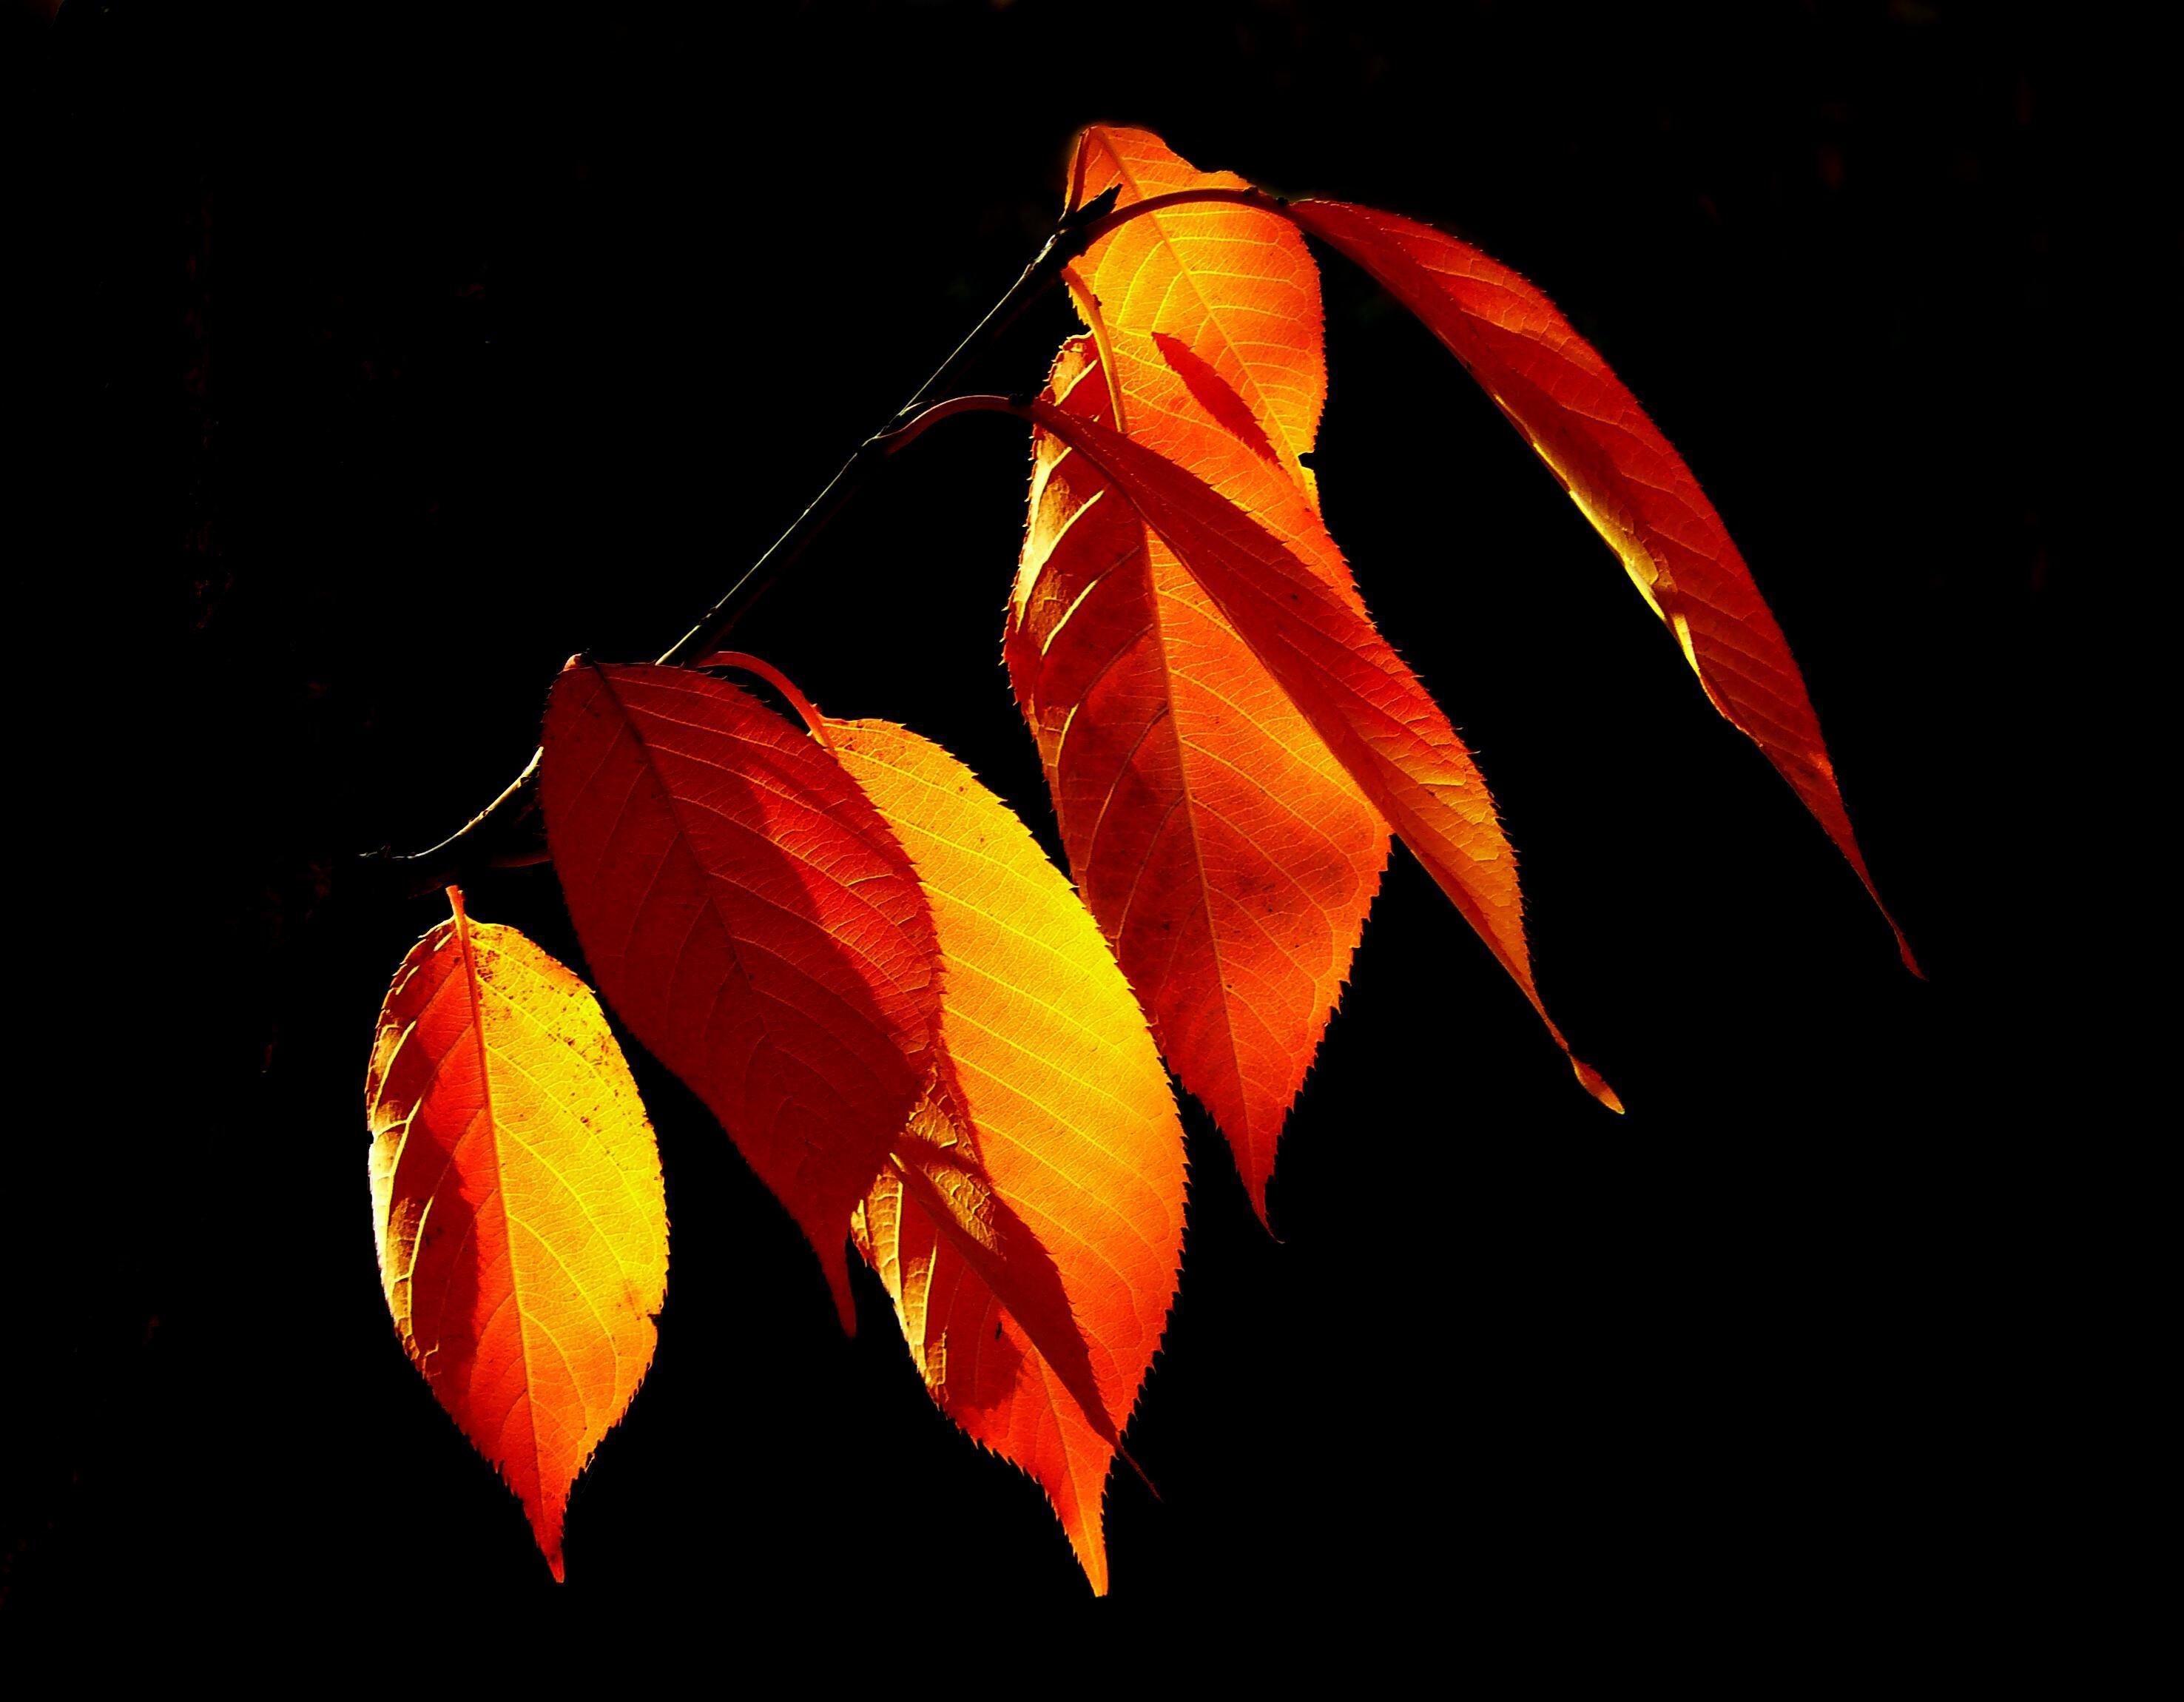 Free Images : tree, nature, flower, petal, atmosphere, orange, red ...